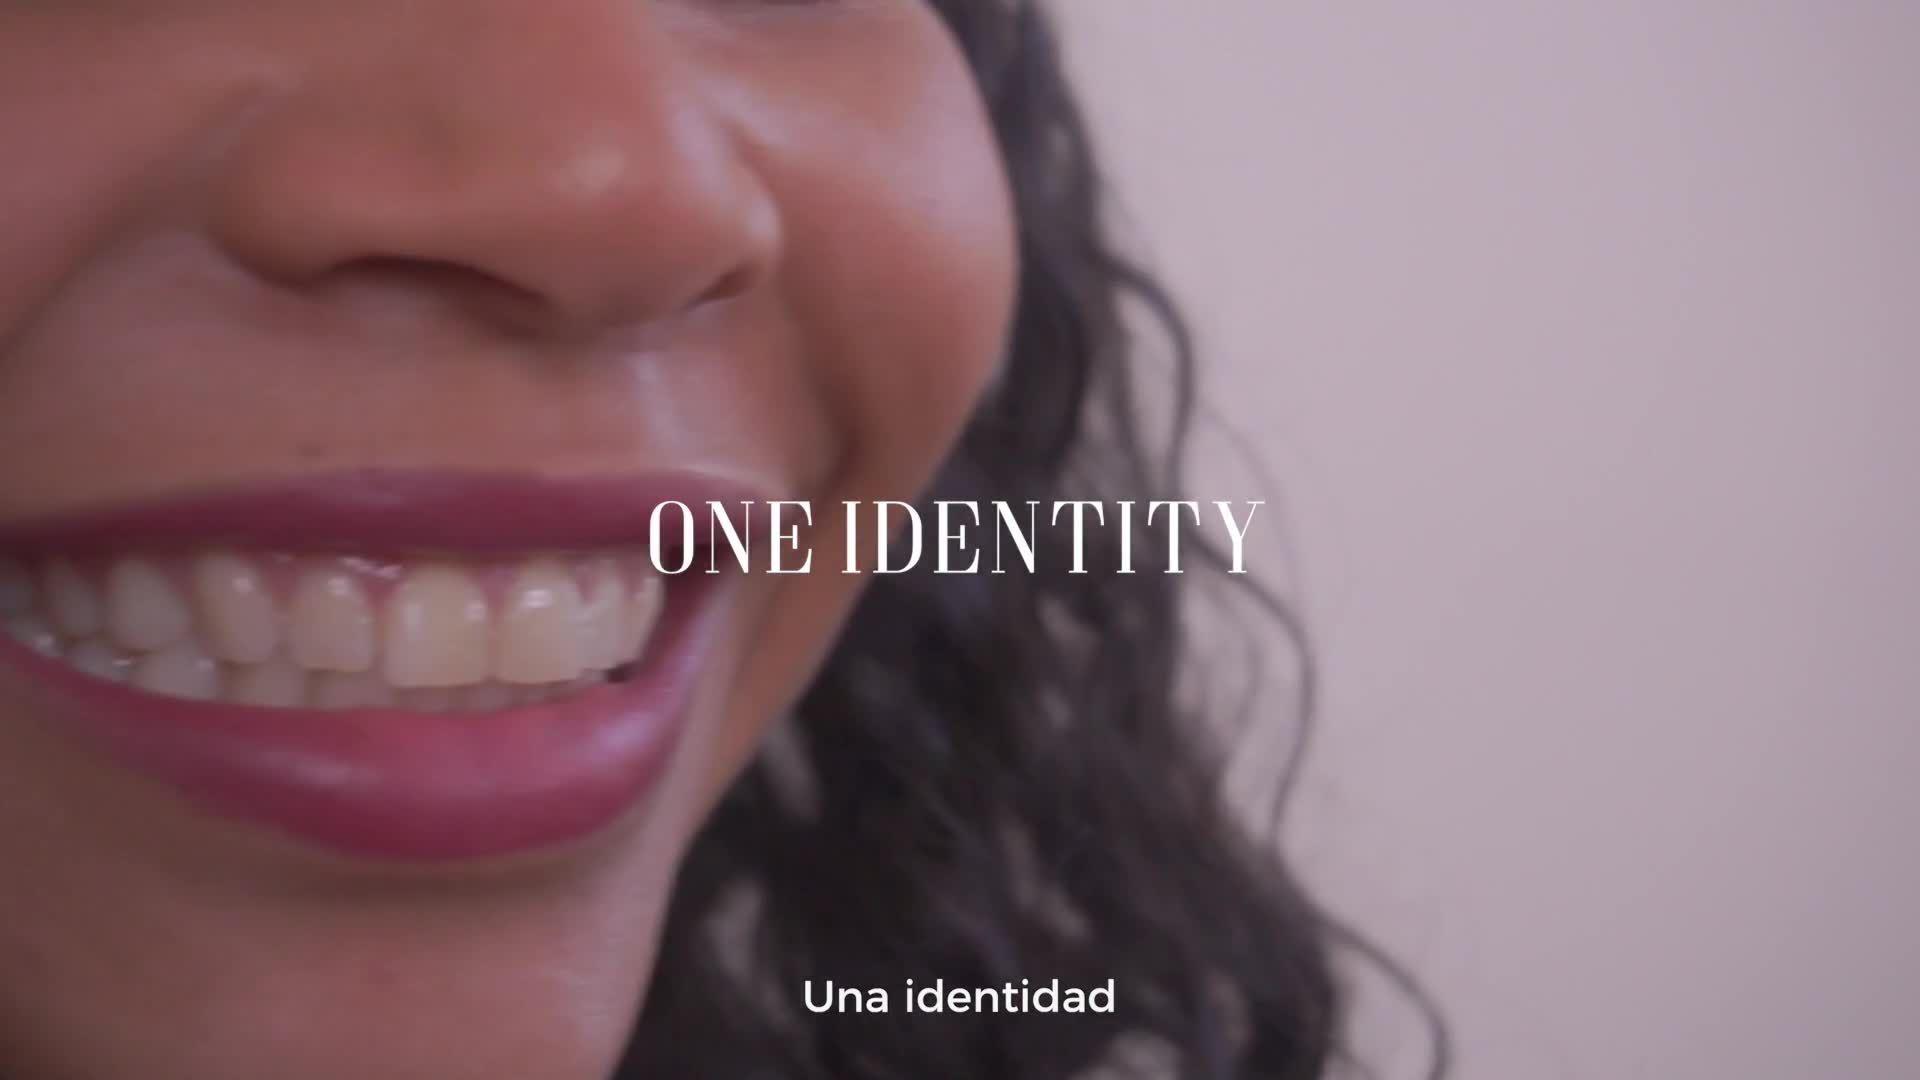 ¡REPRESENTA! | Episode 5 |One Identity